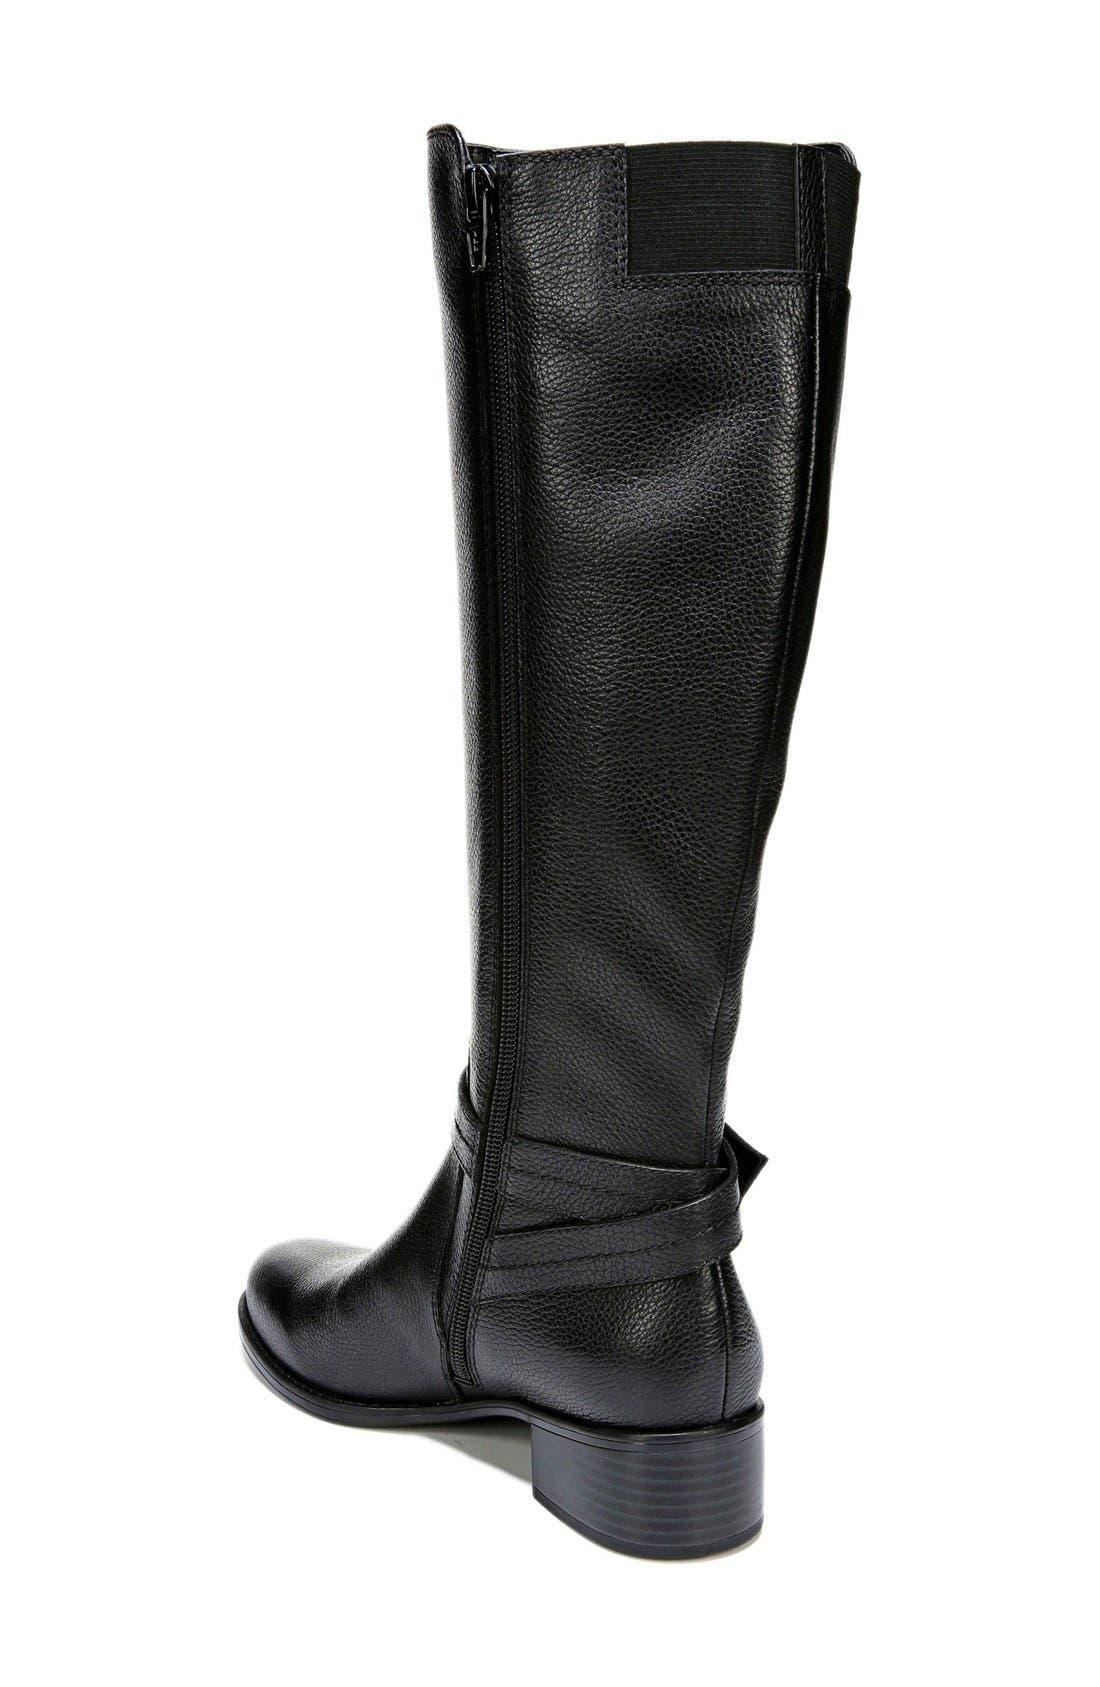 Alternate Image 2  - Naturalizer 'Wynnie' Riding Boot (Women) (Wide Calf)